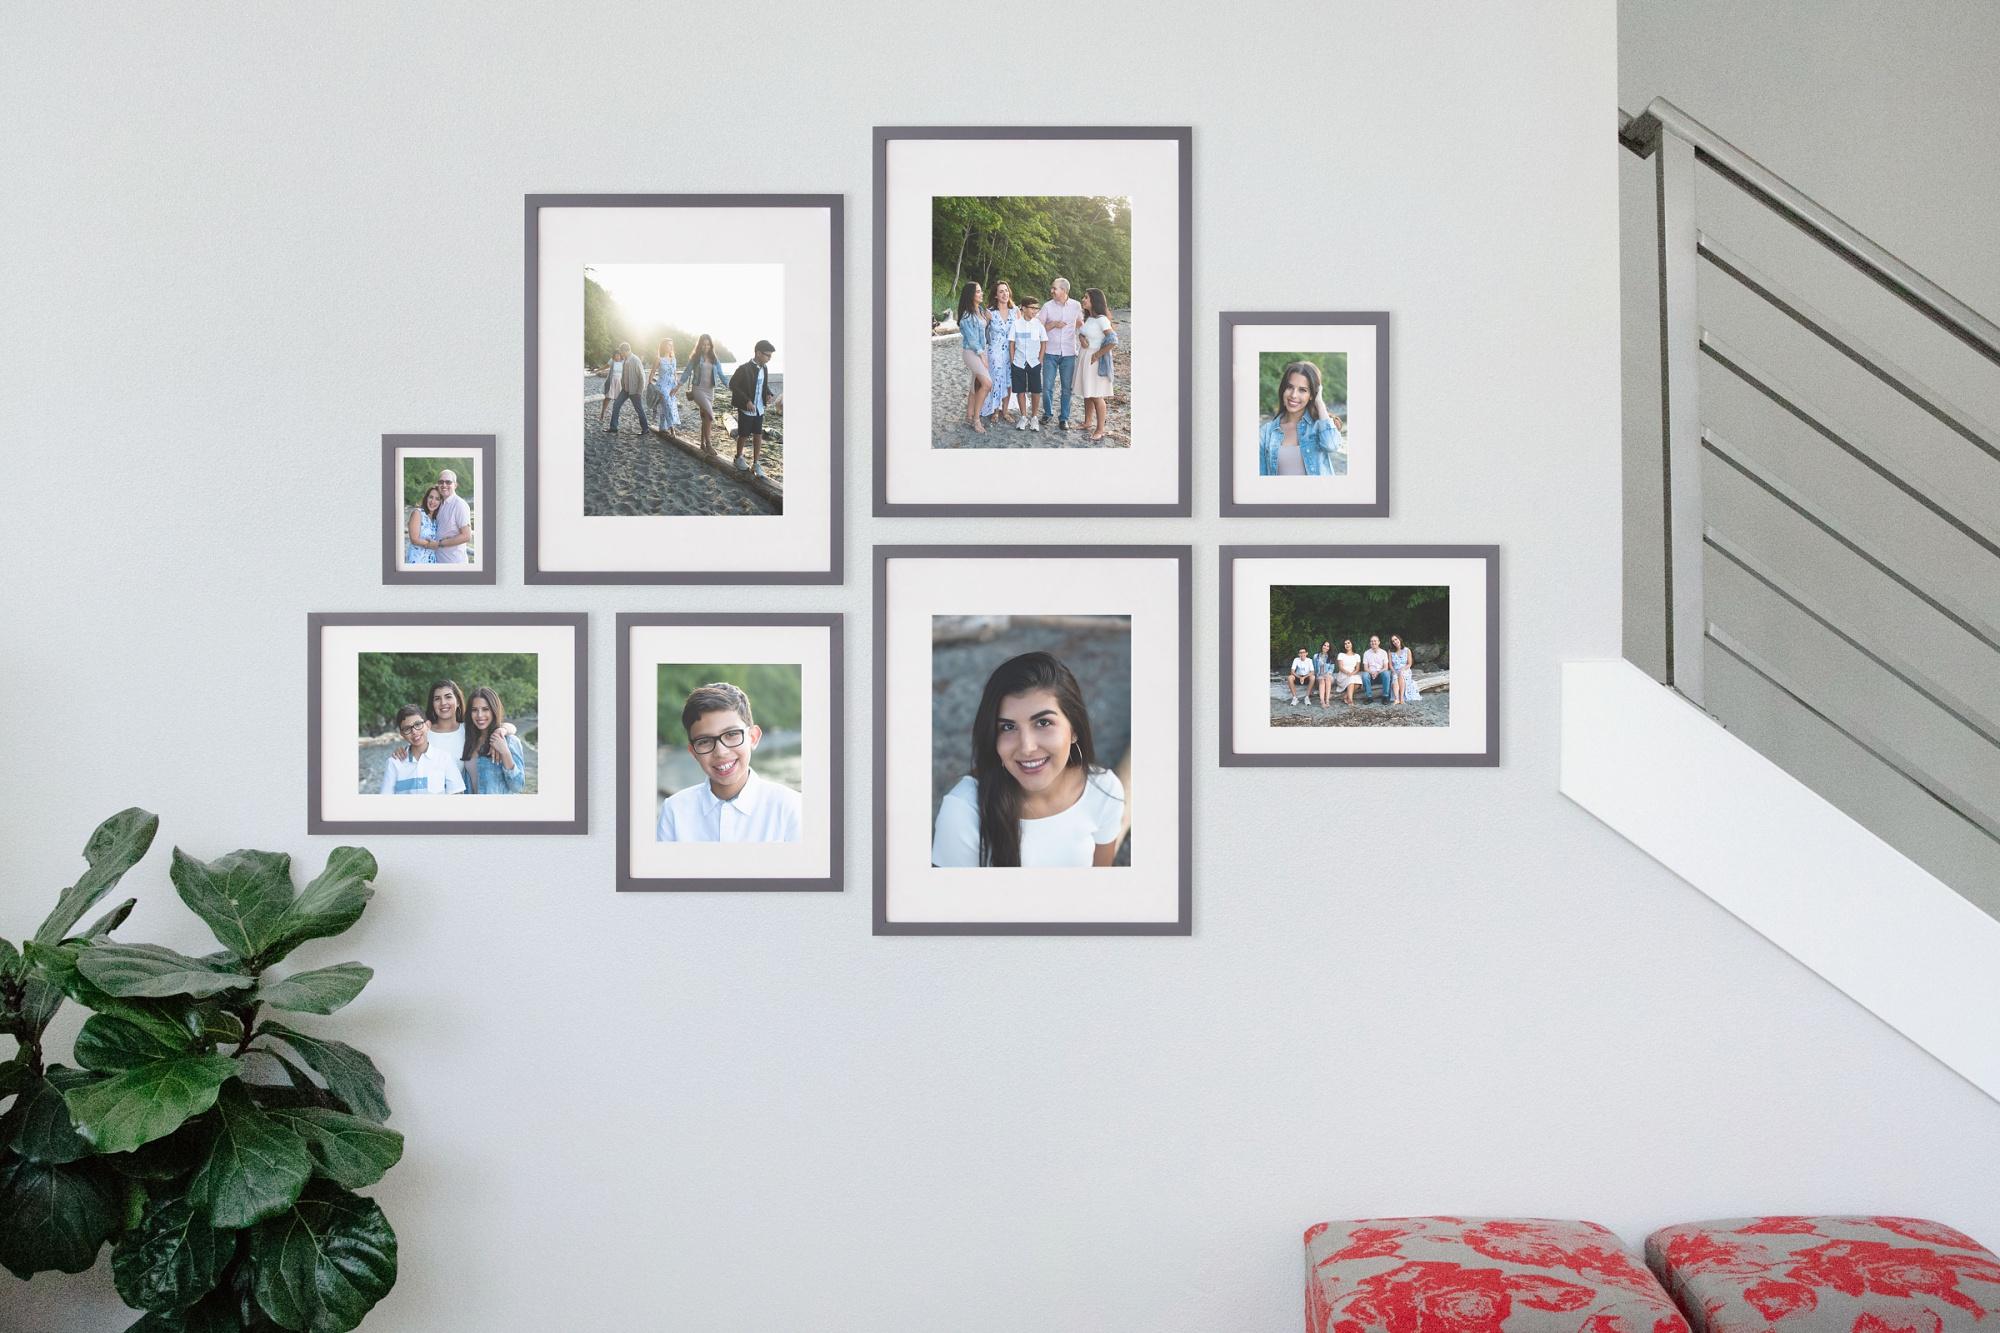 Family Wall Art Display Ideas Victoria BC Photographer.jpg